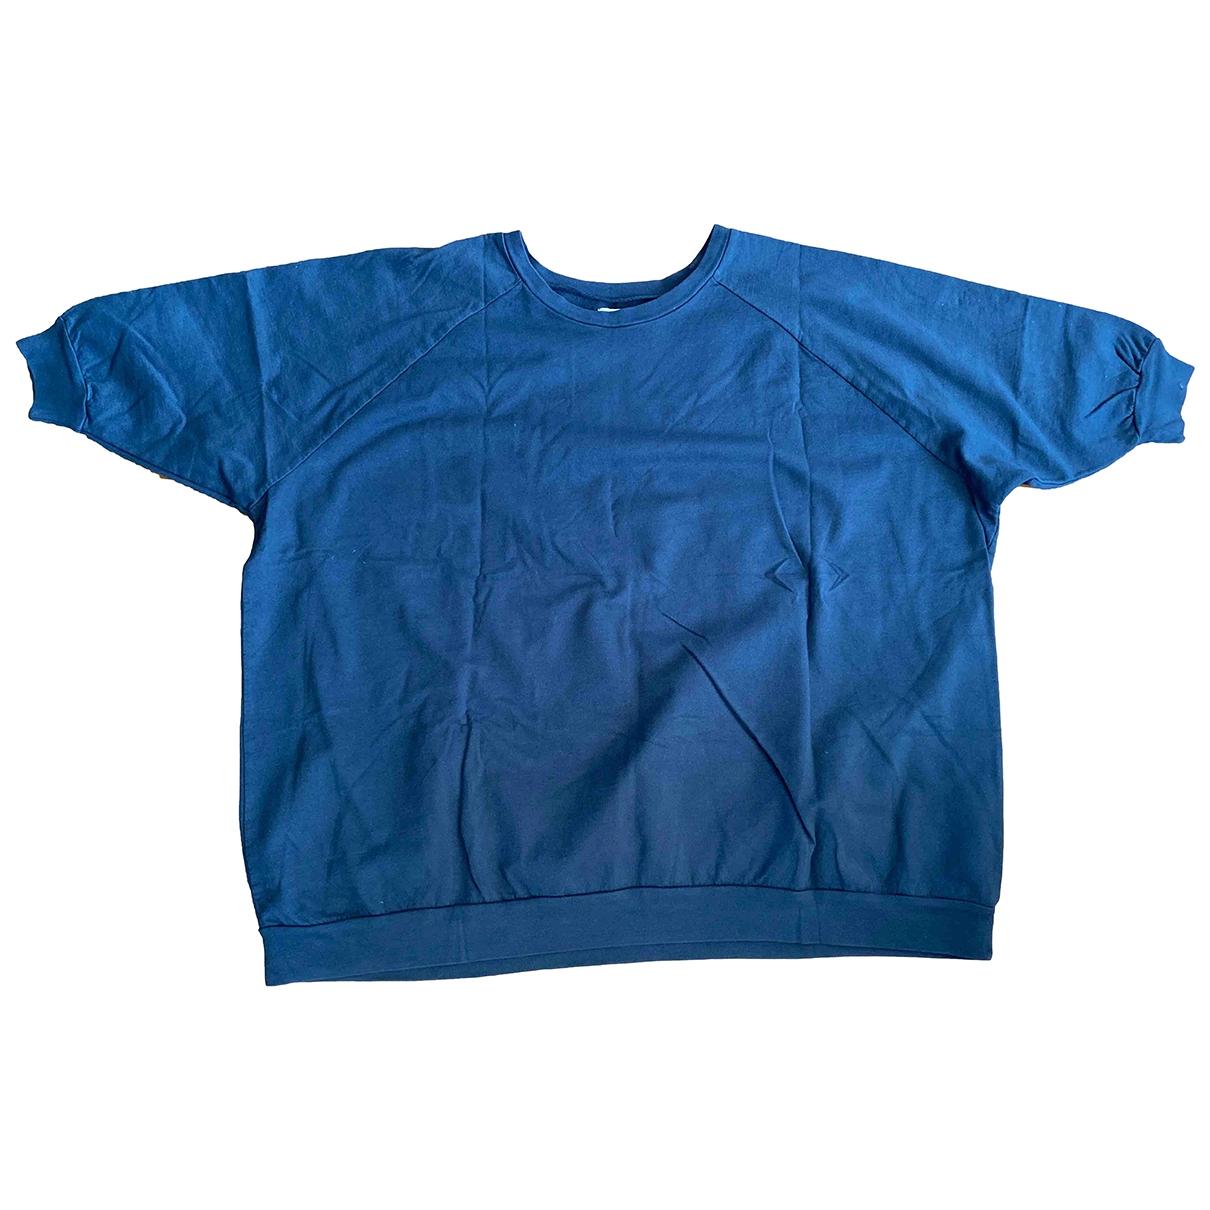 Mads Norgarrd Copenhagen \N Anthracite Cotton Knitwear for Women S International